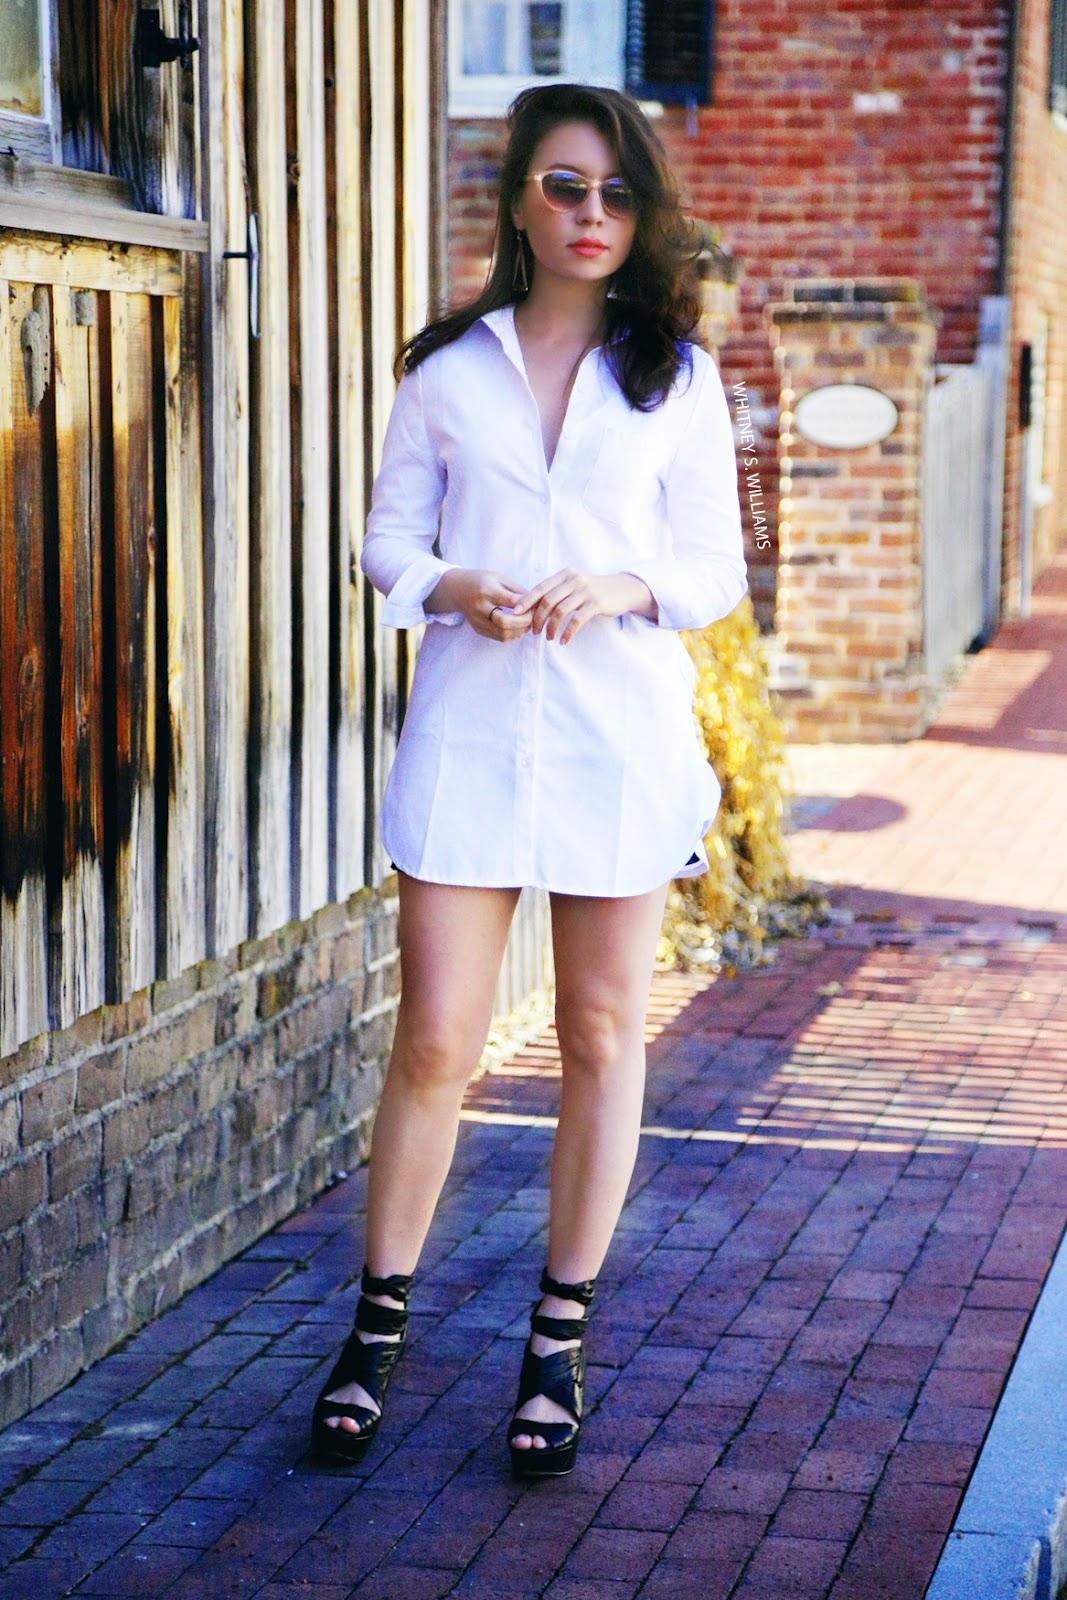 a+la+ladywolf_whitney+s+williams_white+shirt+dress+(3).jpg